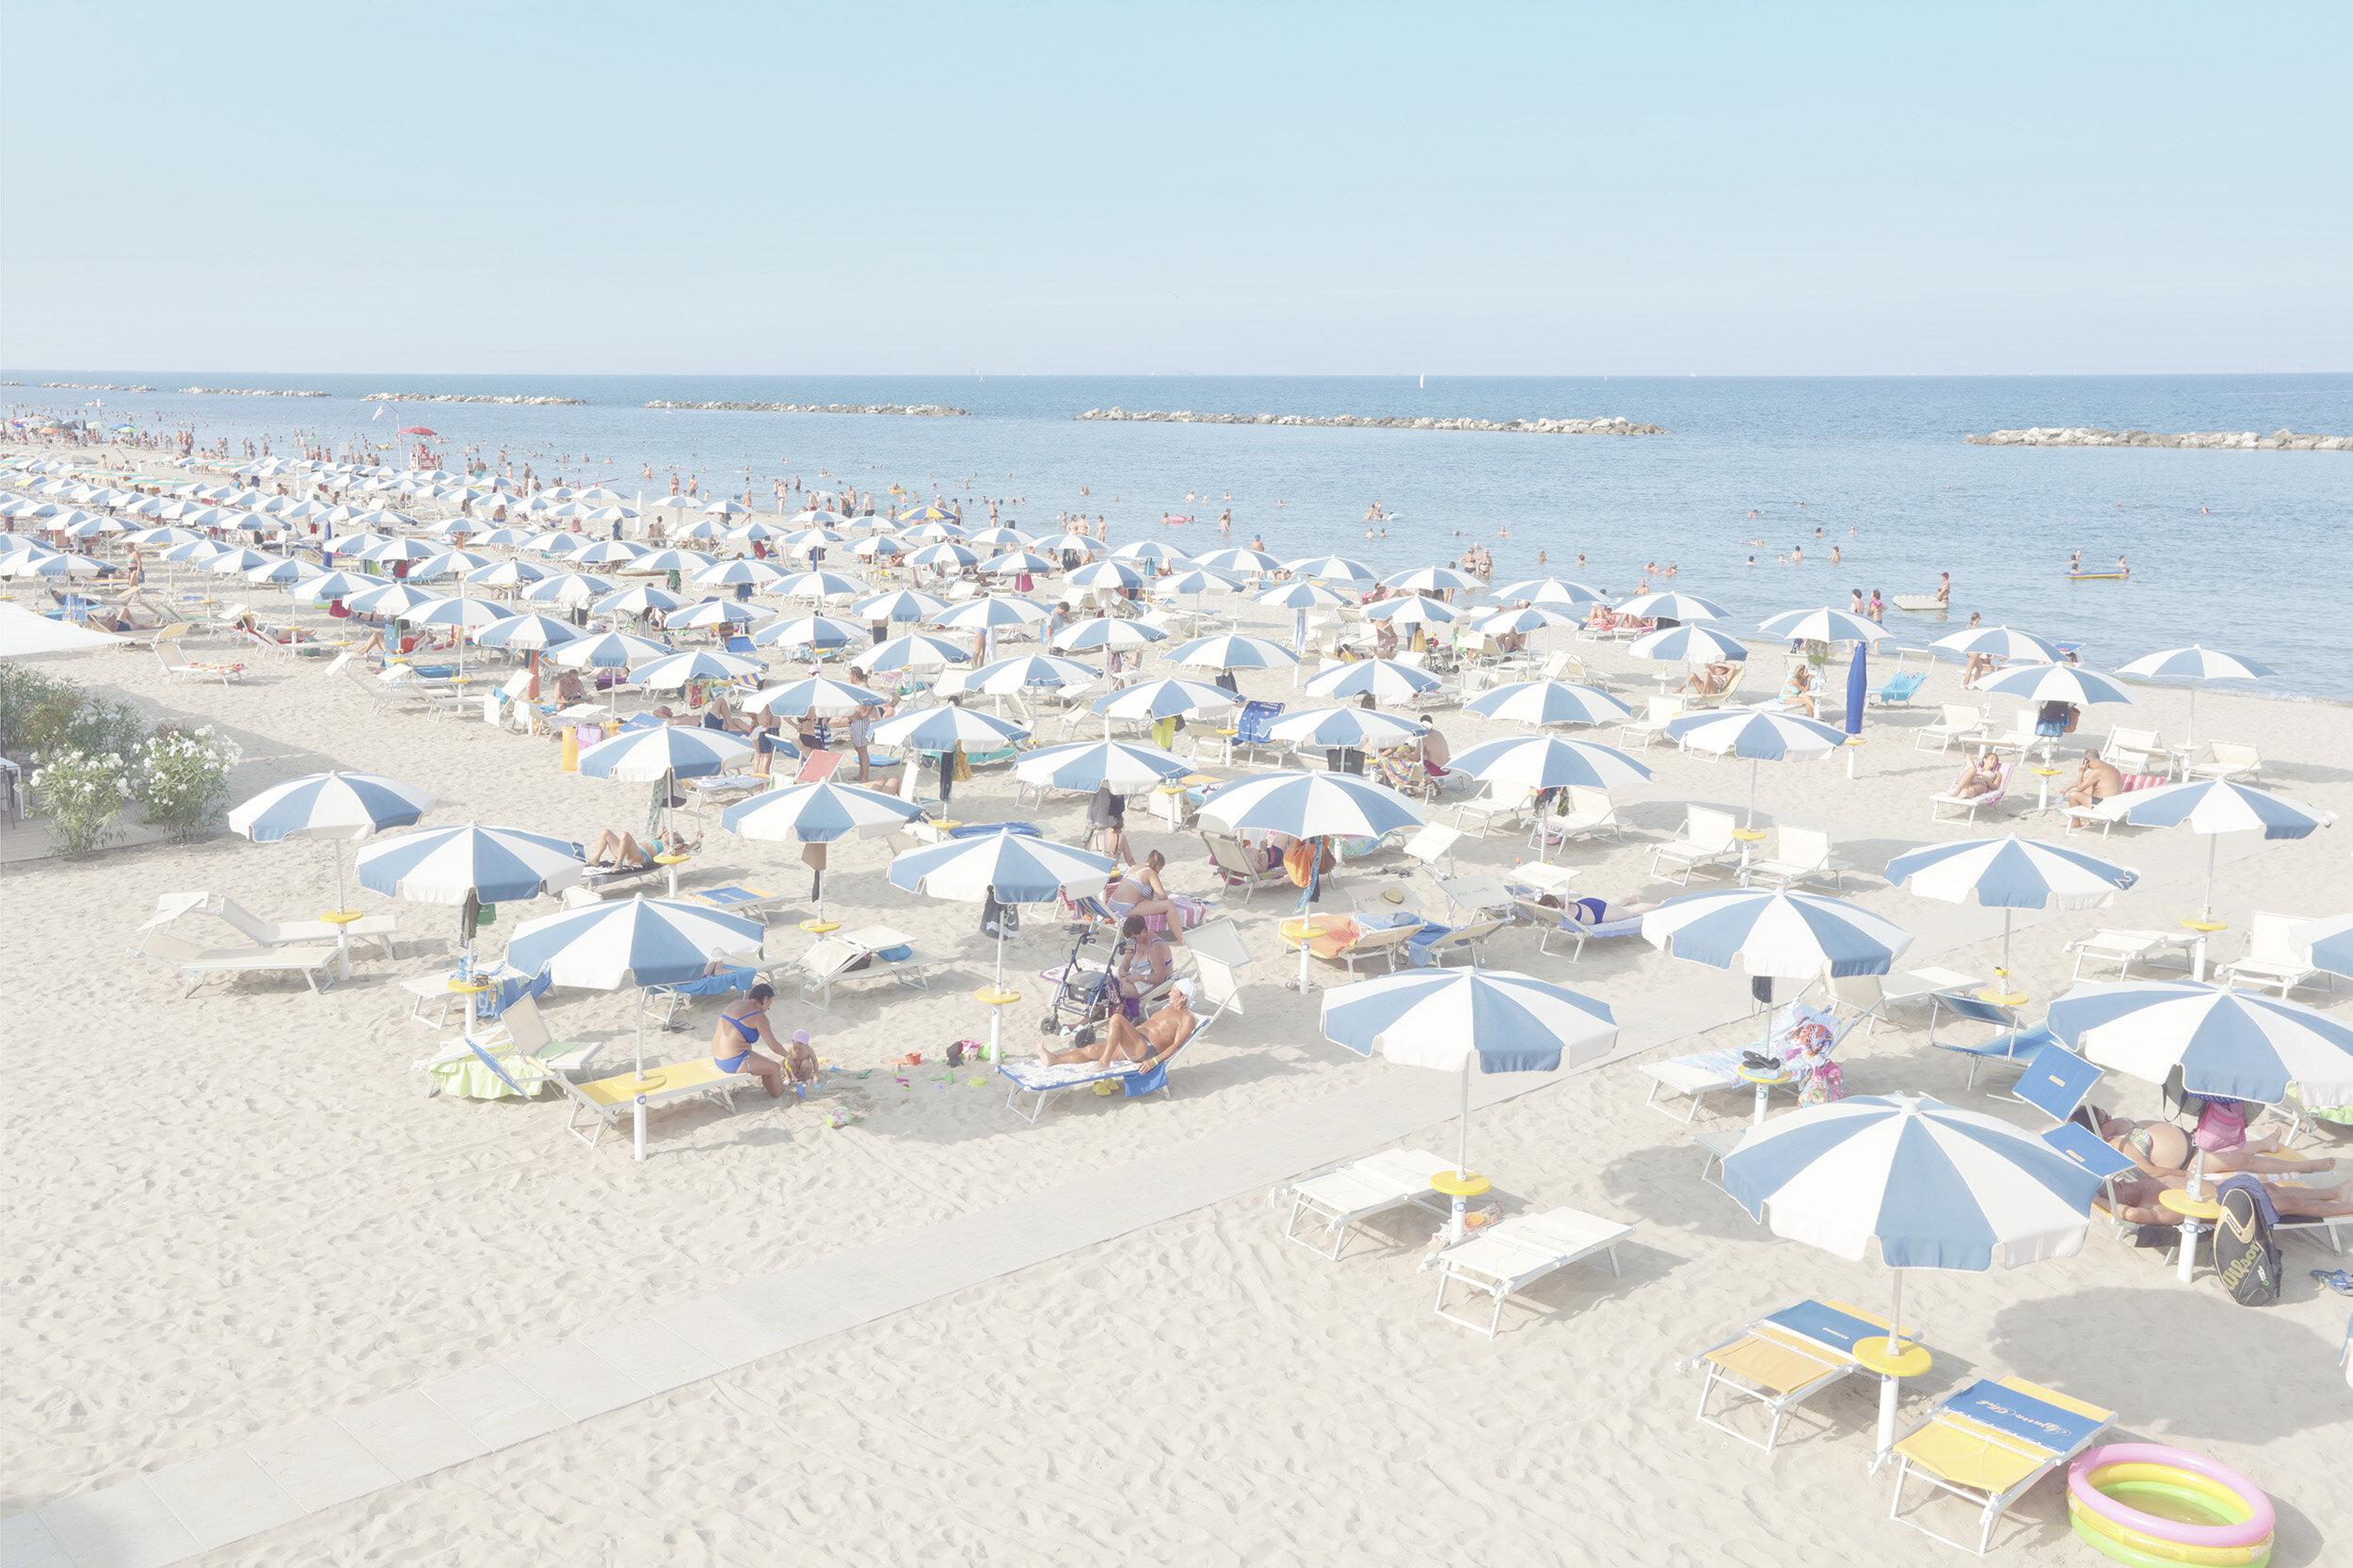 Spiaggia IV - Lido Adriano, 2018